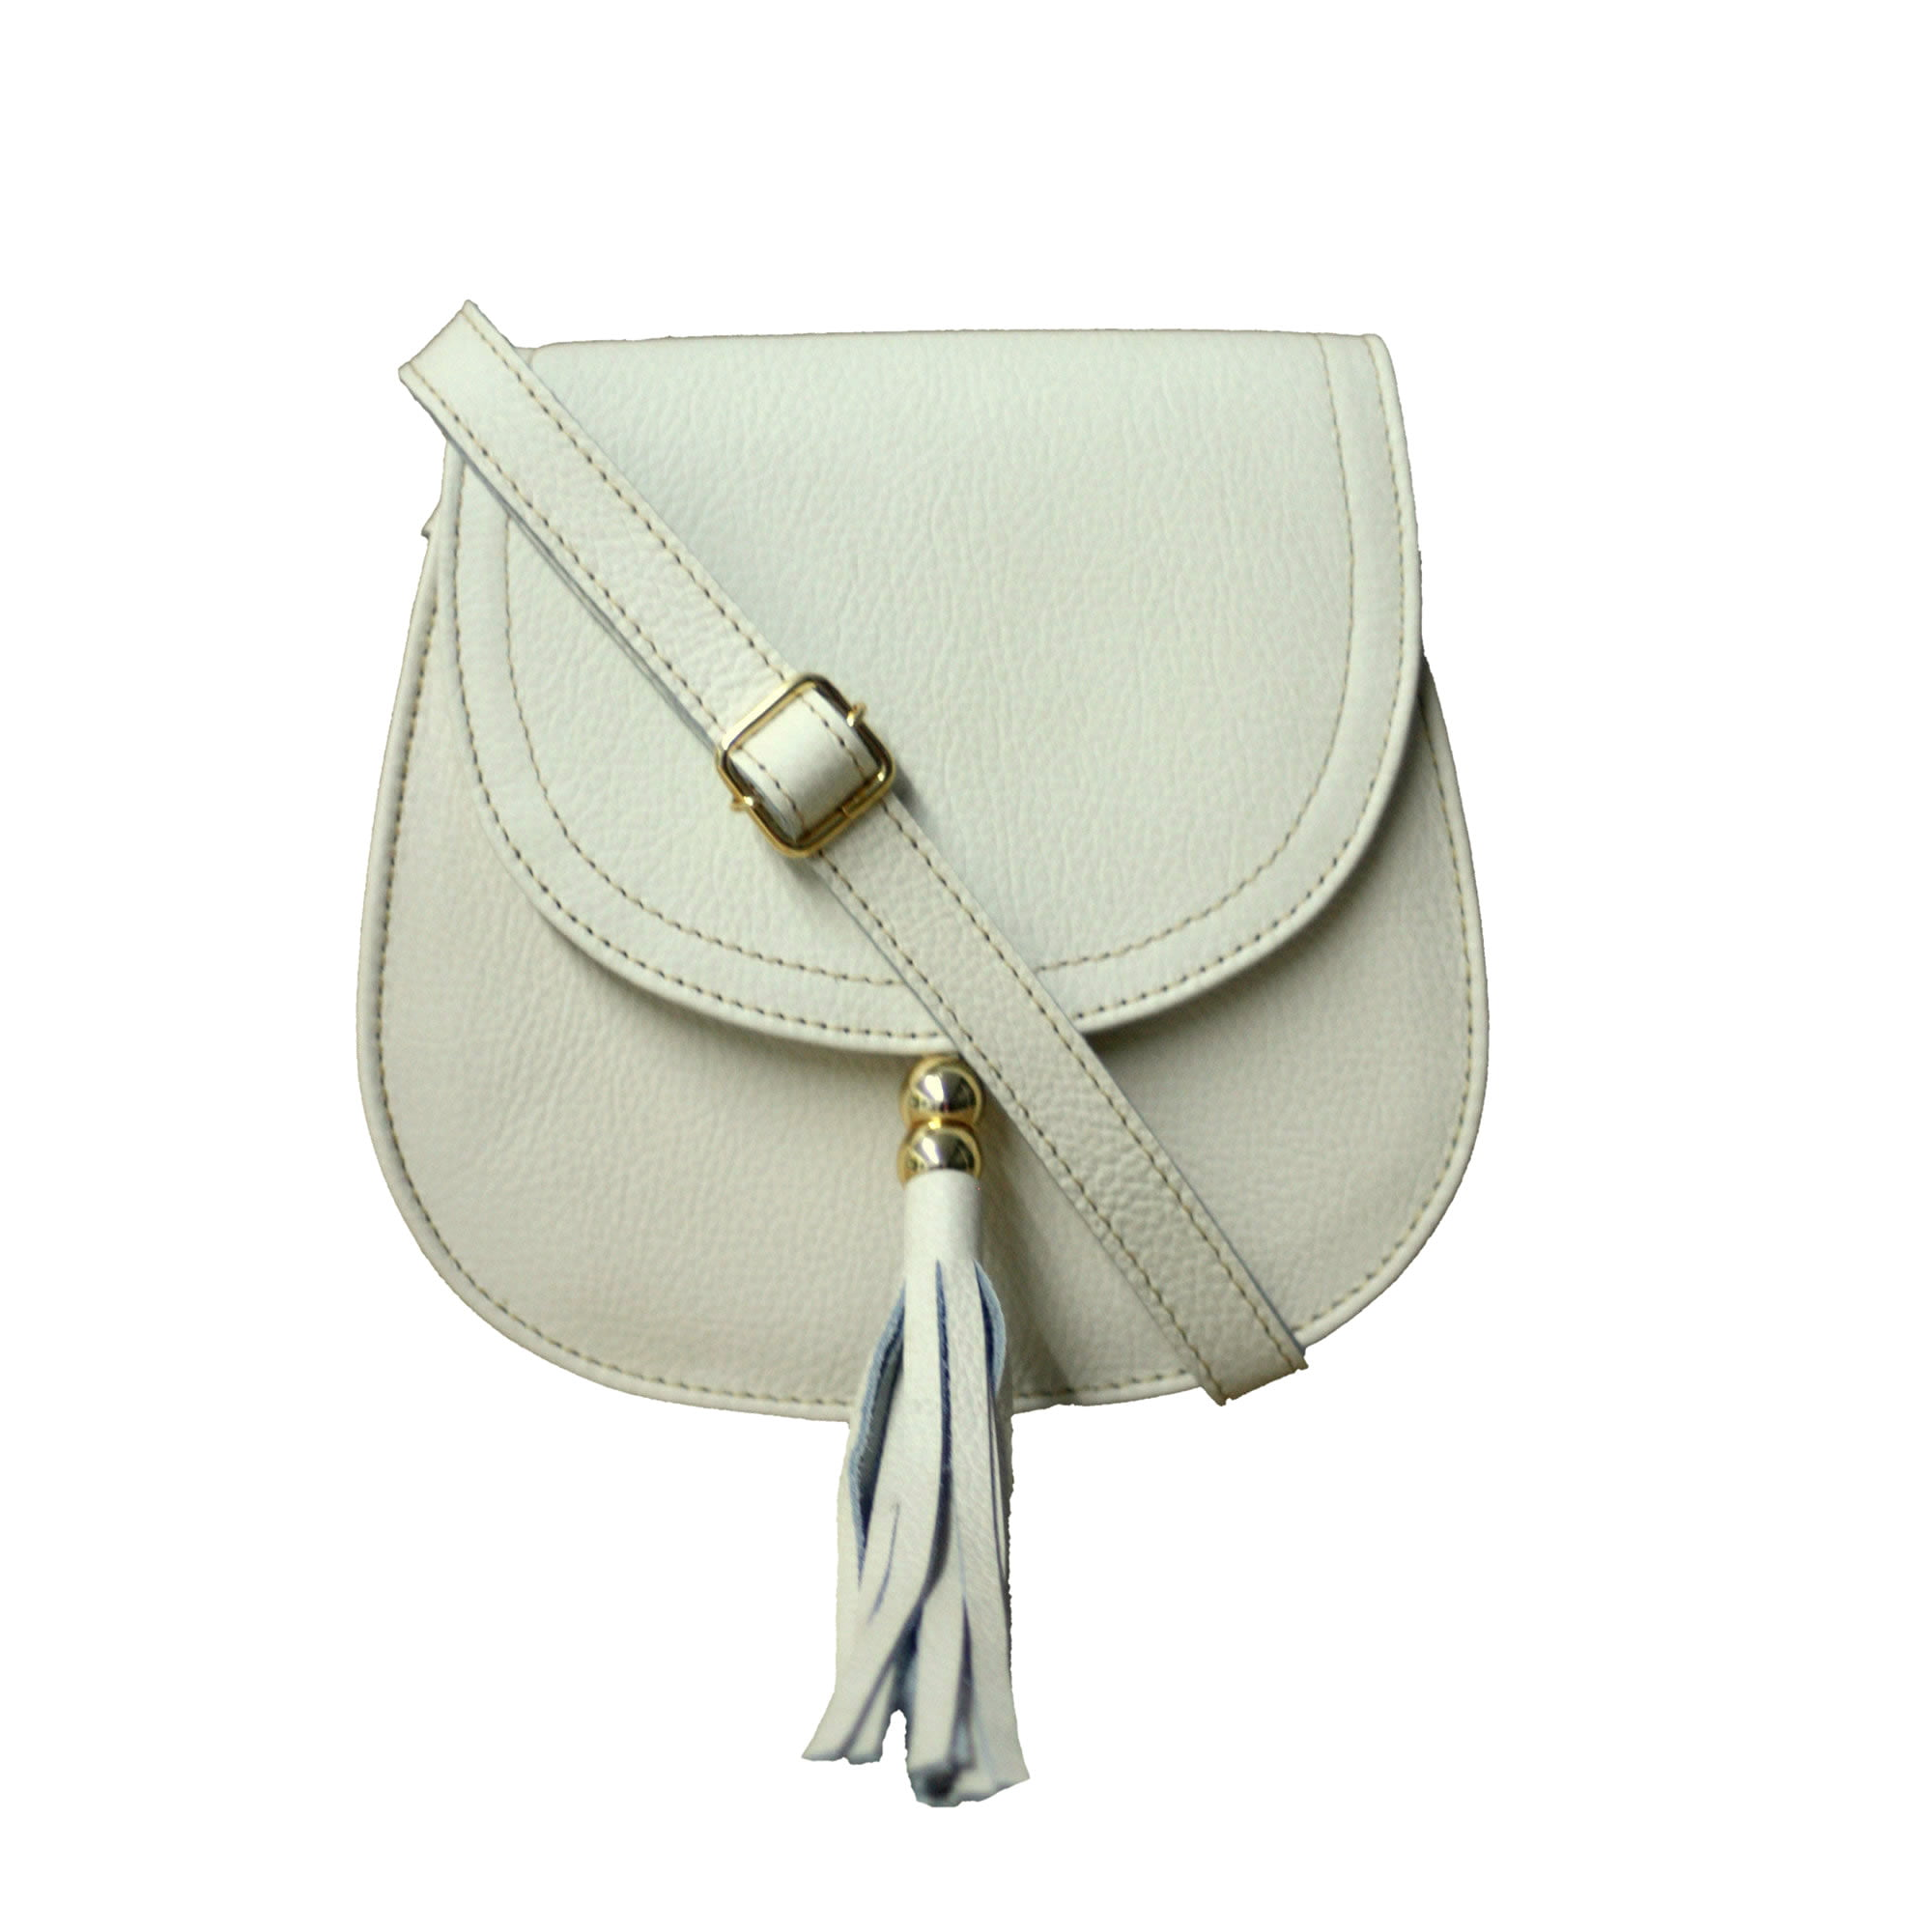 b4c2fa600 Bolsa de couro estruturada branca Nápoles